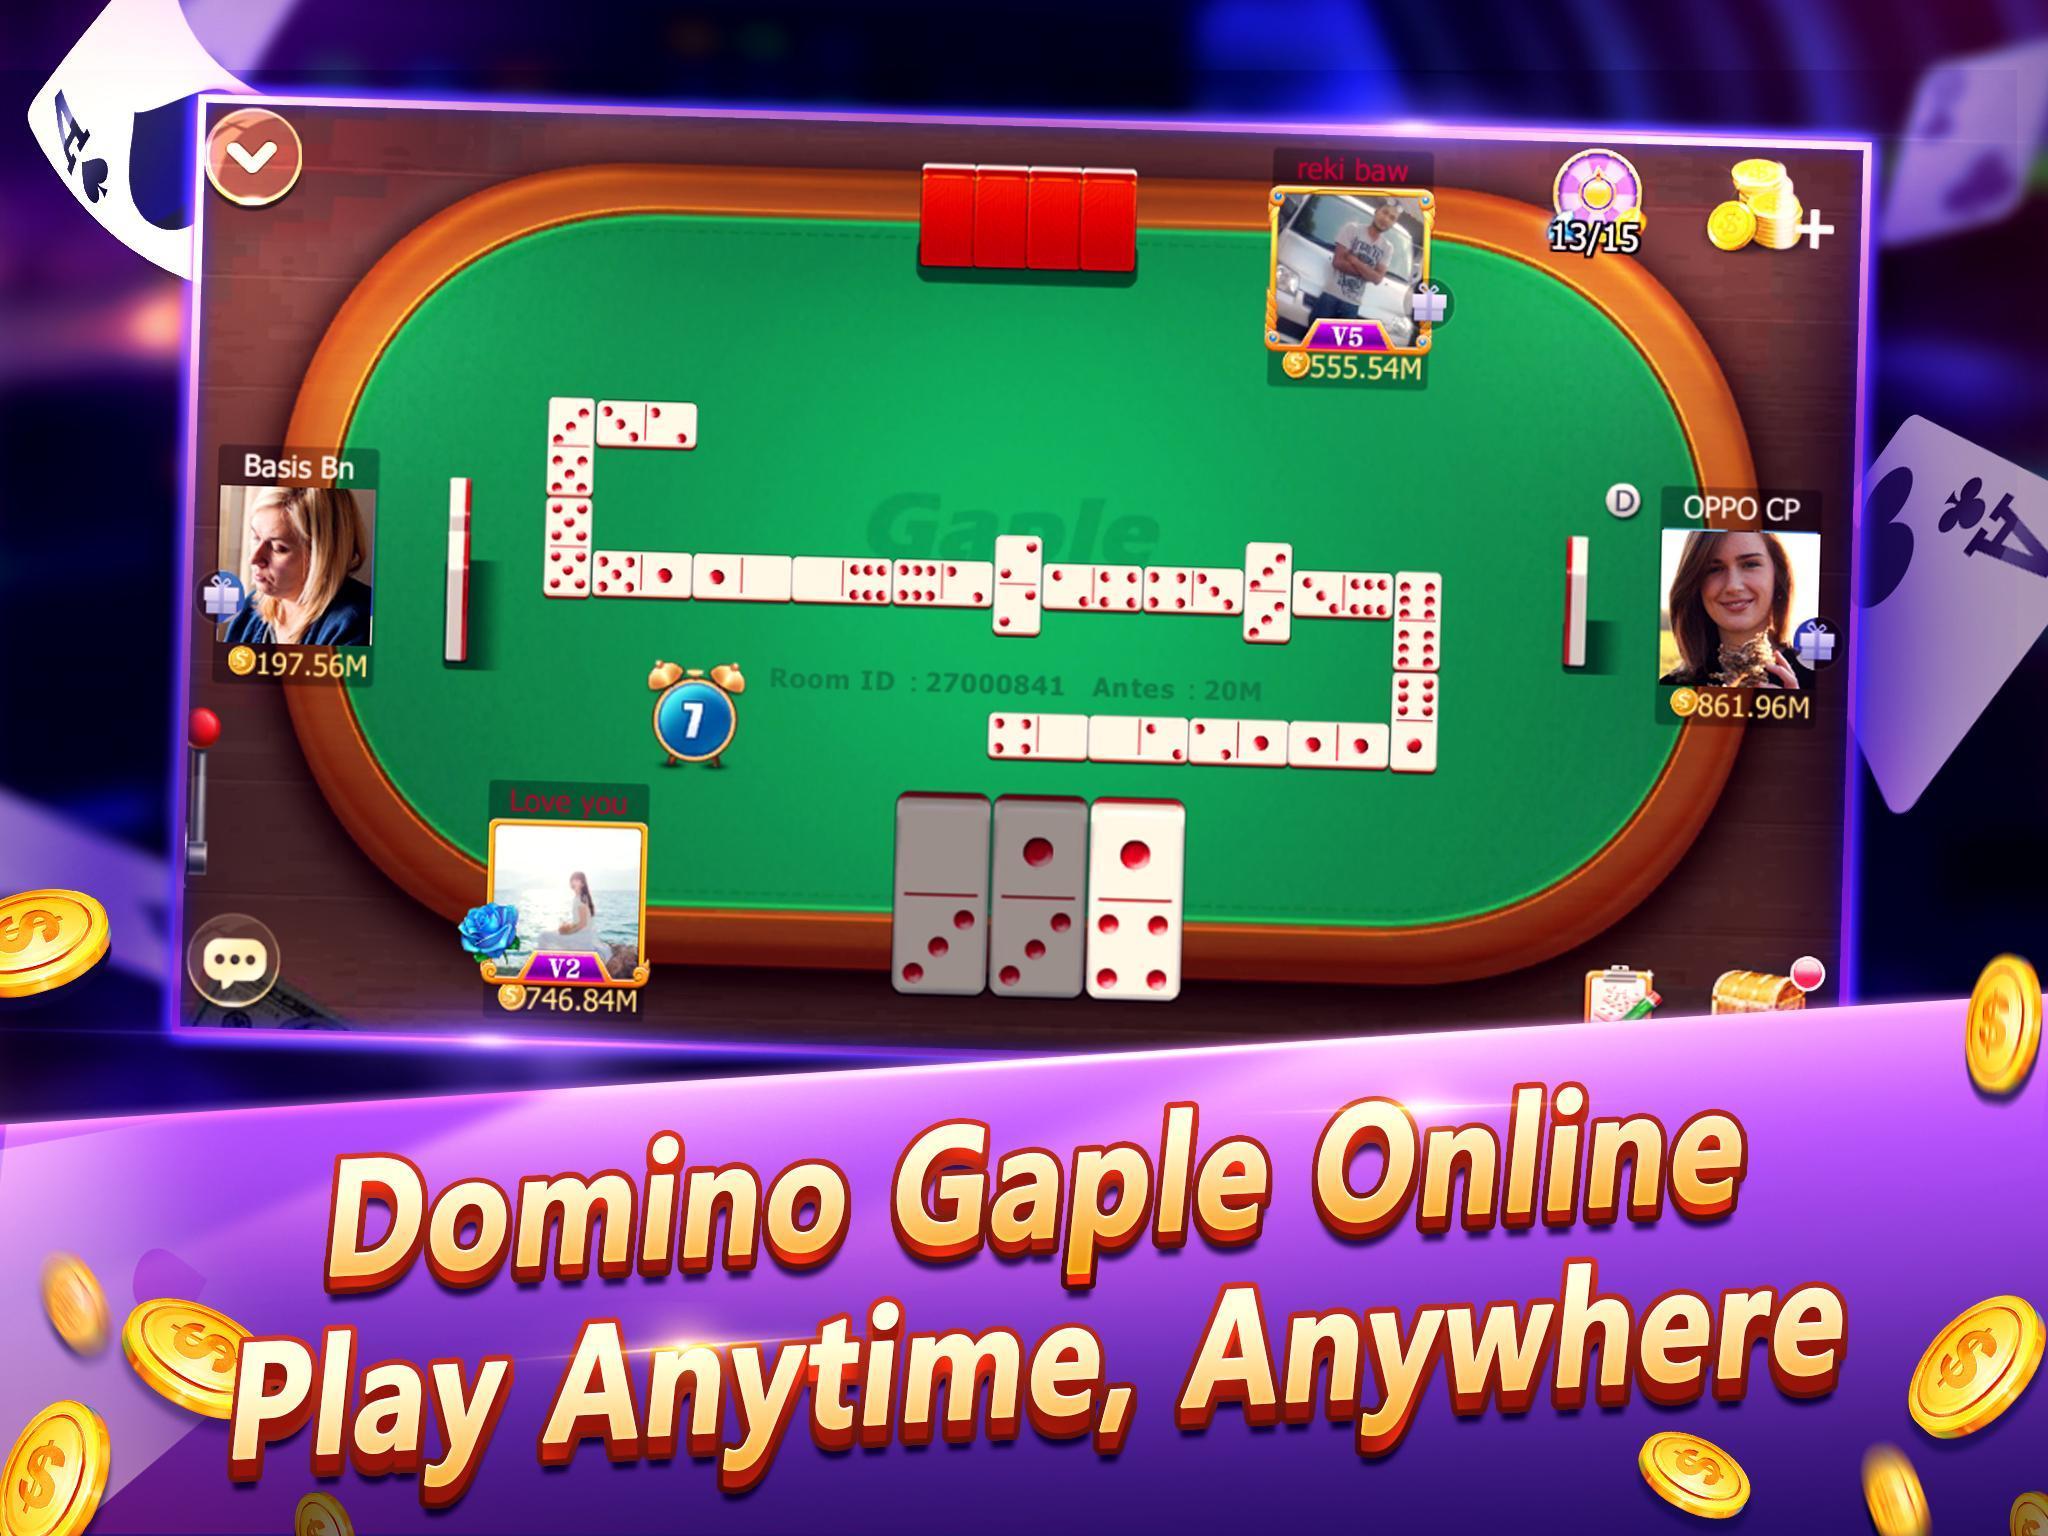 Domino Gaple 2018 Online Game Para Android Apk Baixar